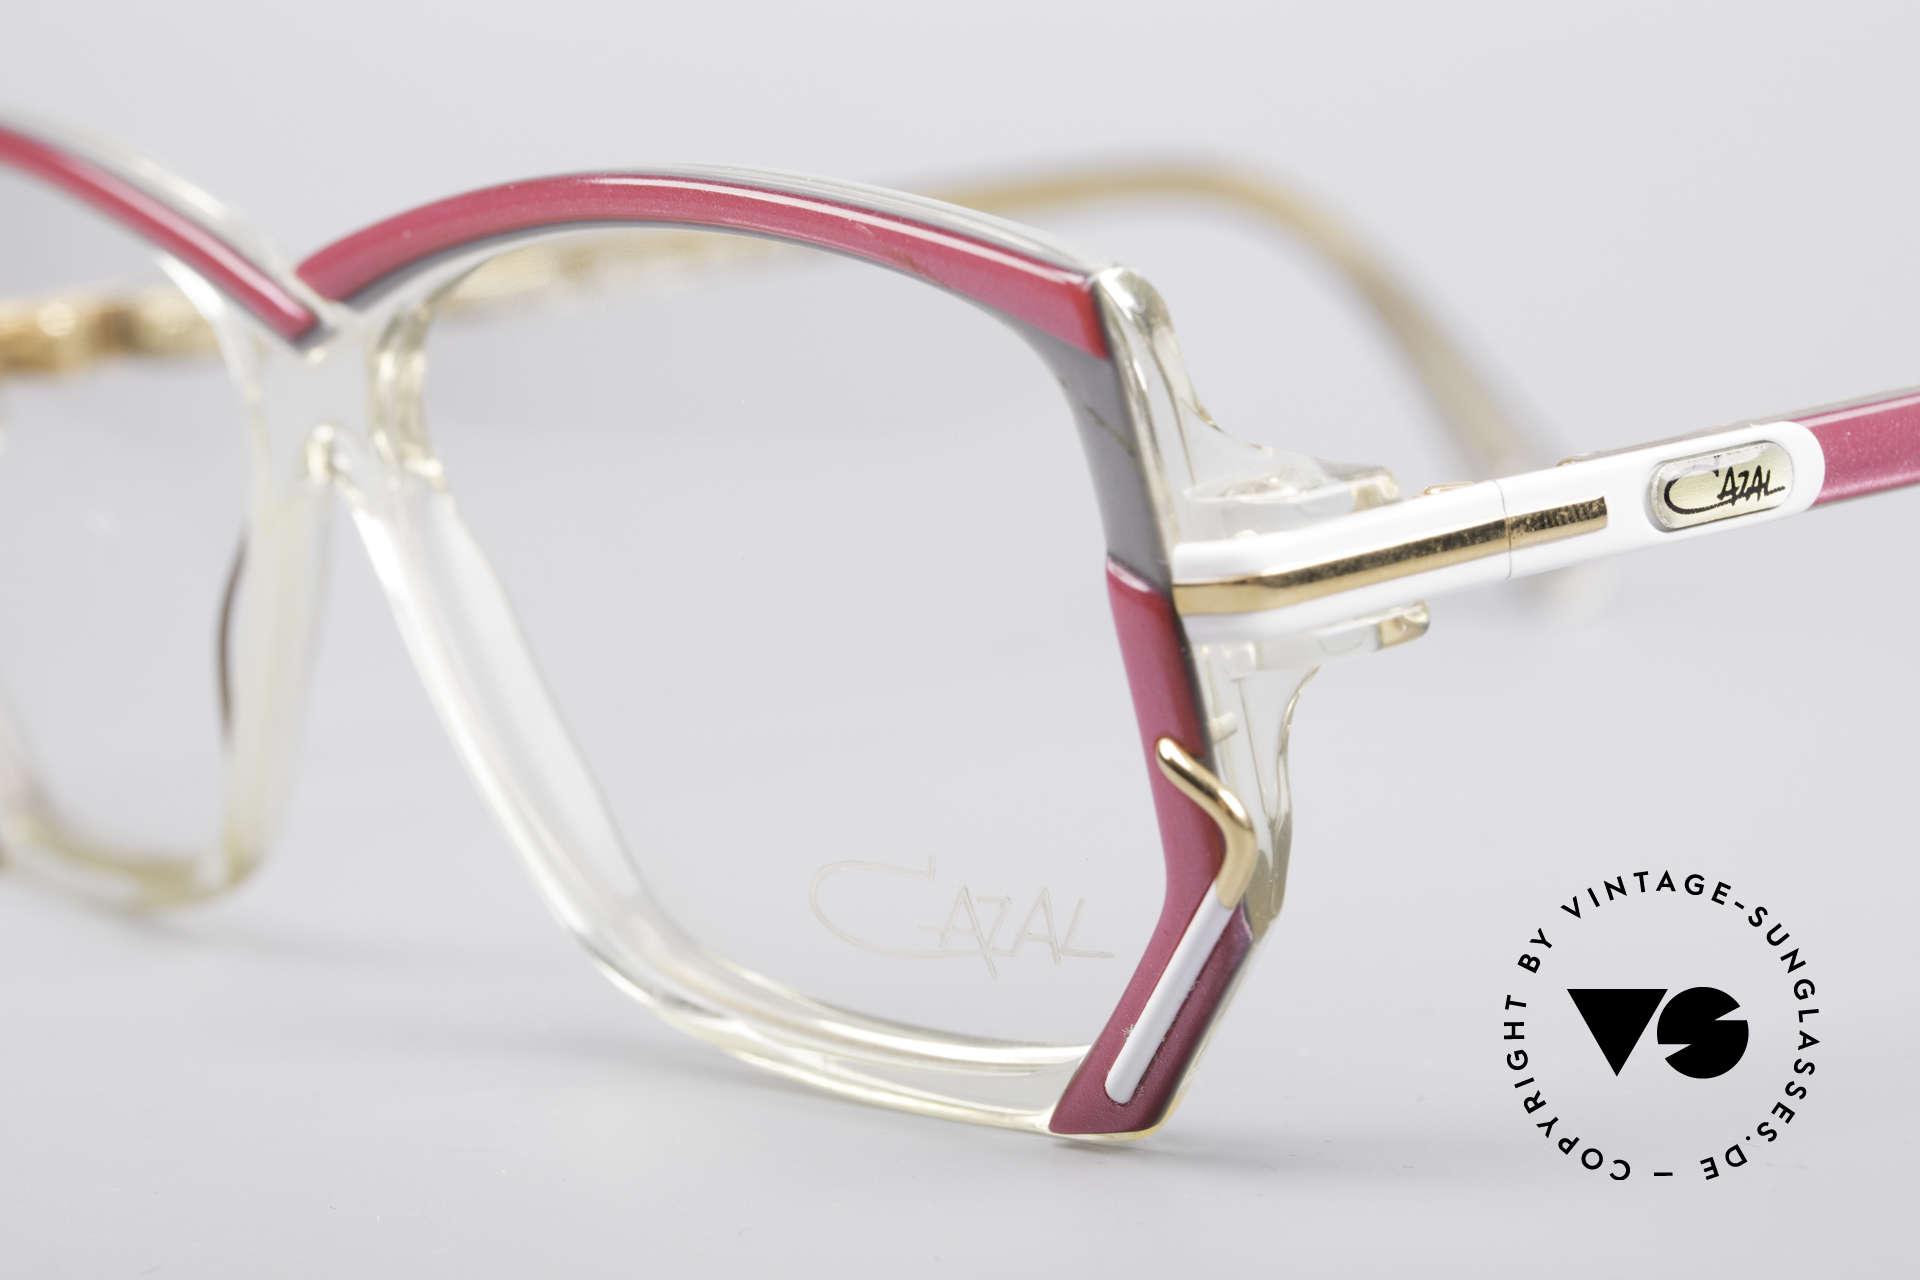 Cazal 197 80's Designer Glasses, new old stock (like all our vintage eyewear by Cazal), Made for Women